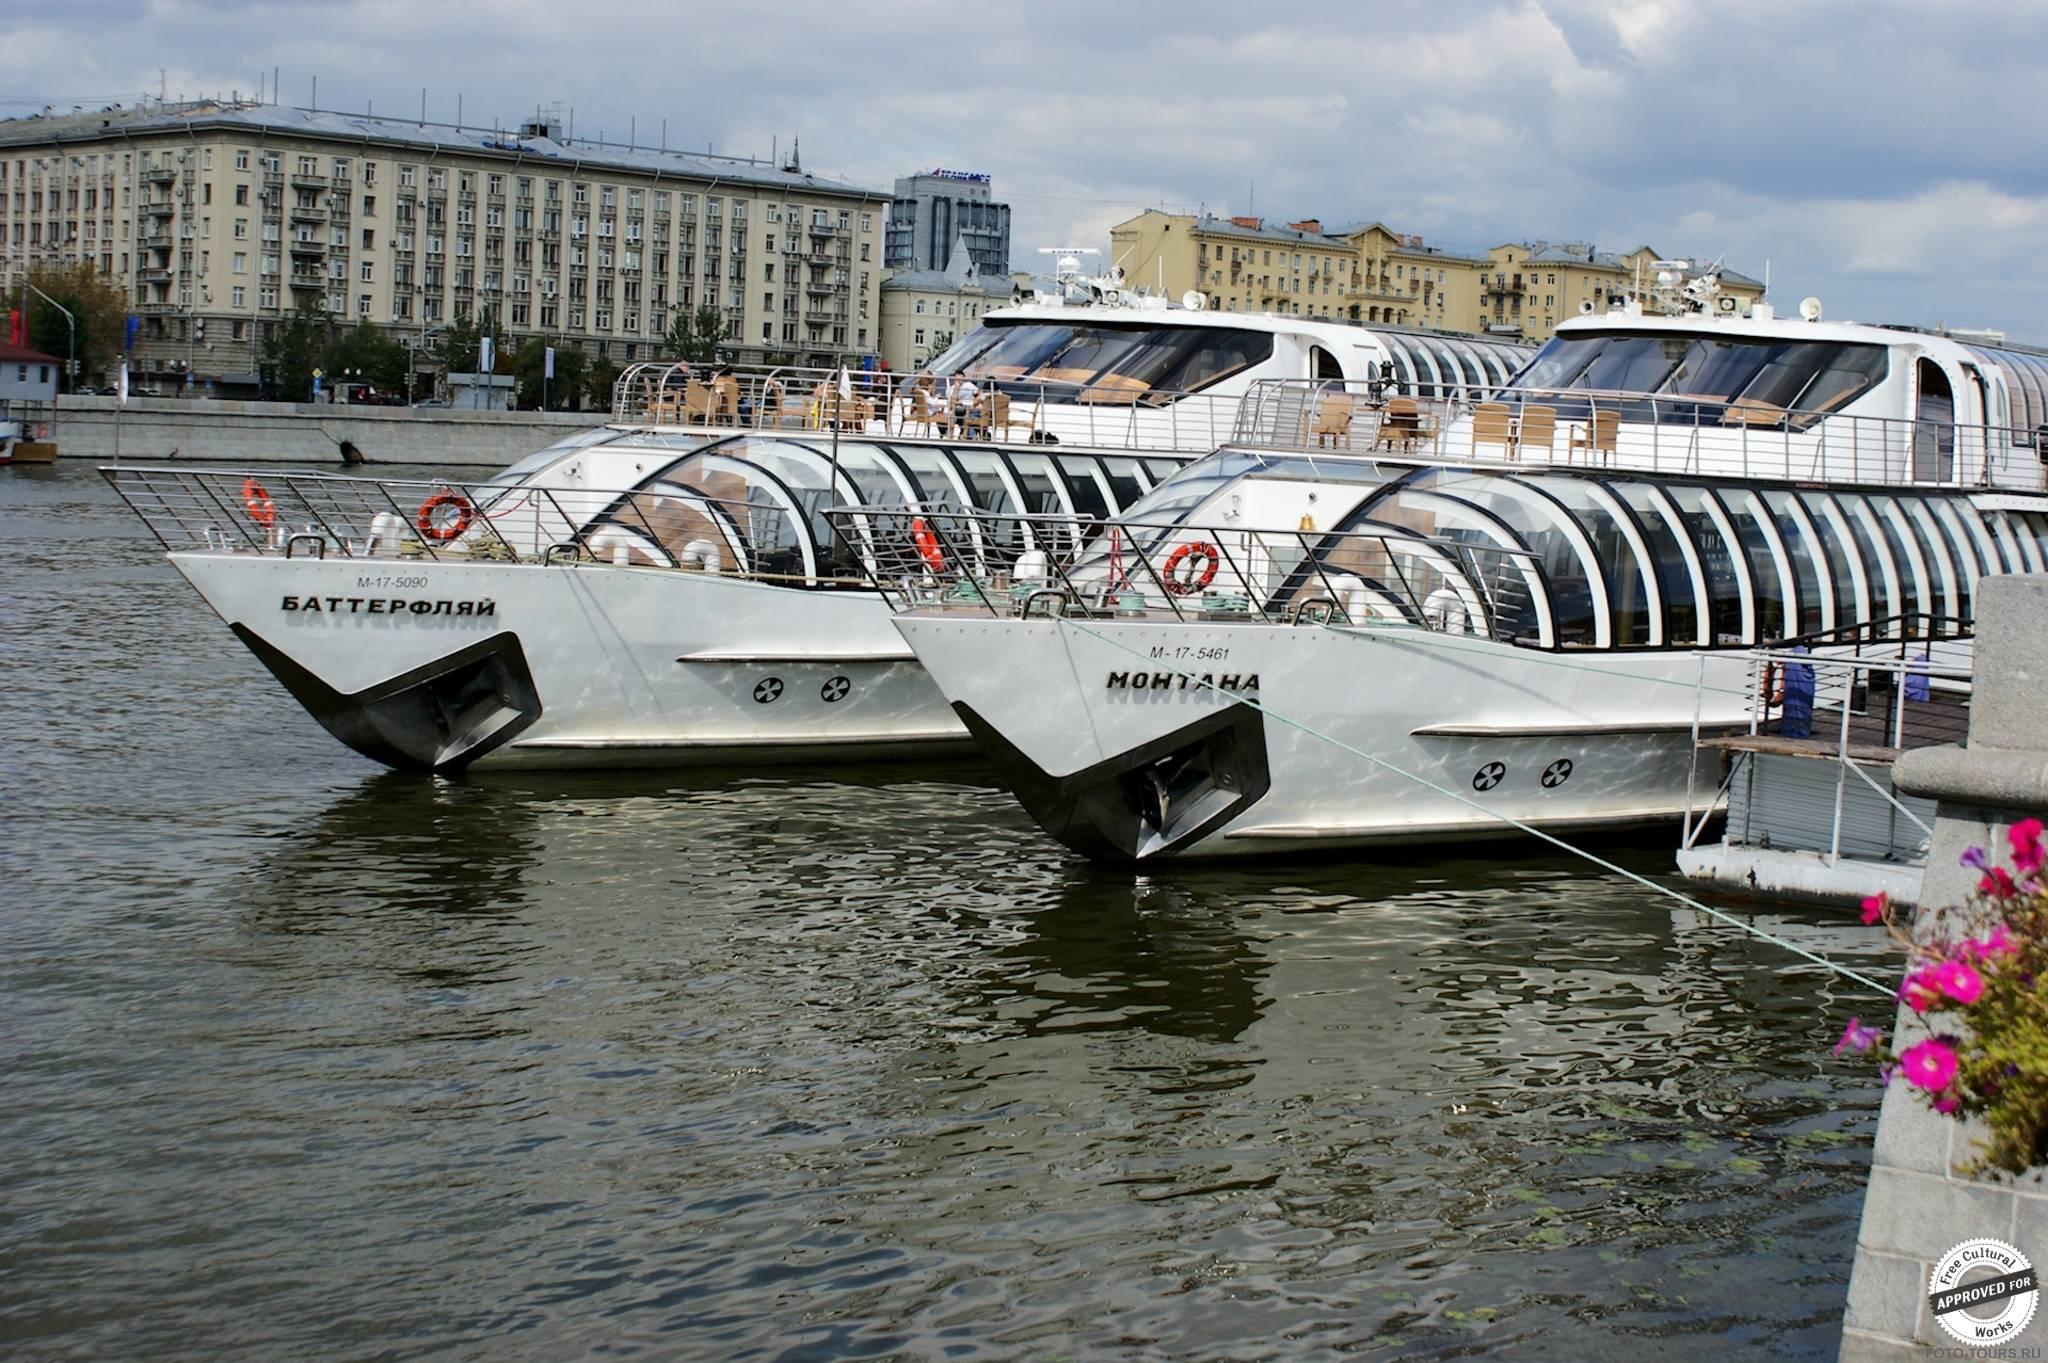 ЦПКиО им. Горького, Москва, Россия.